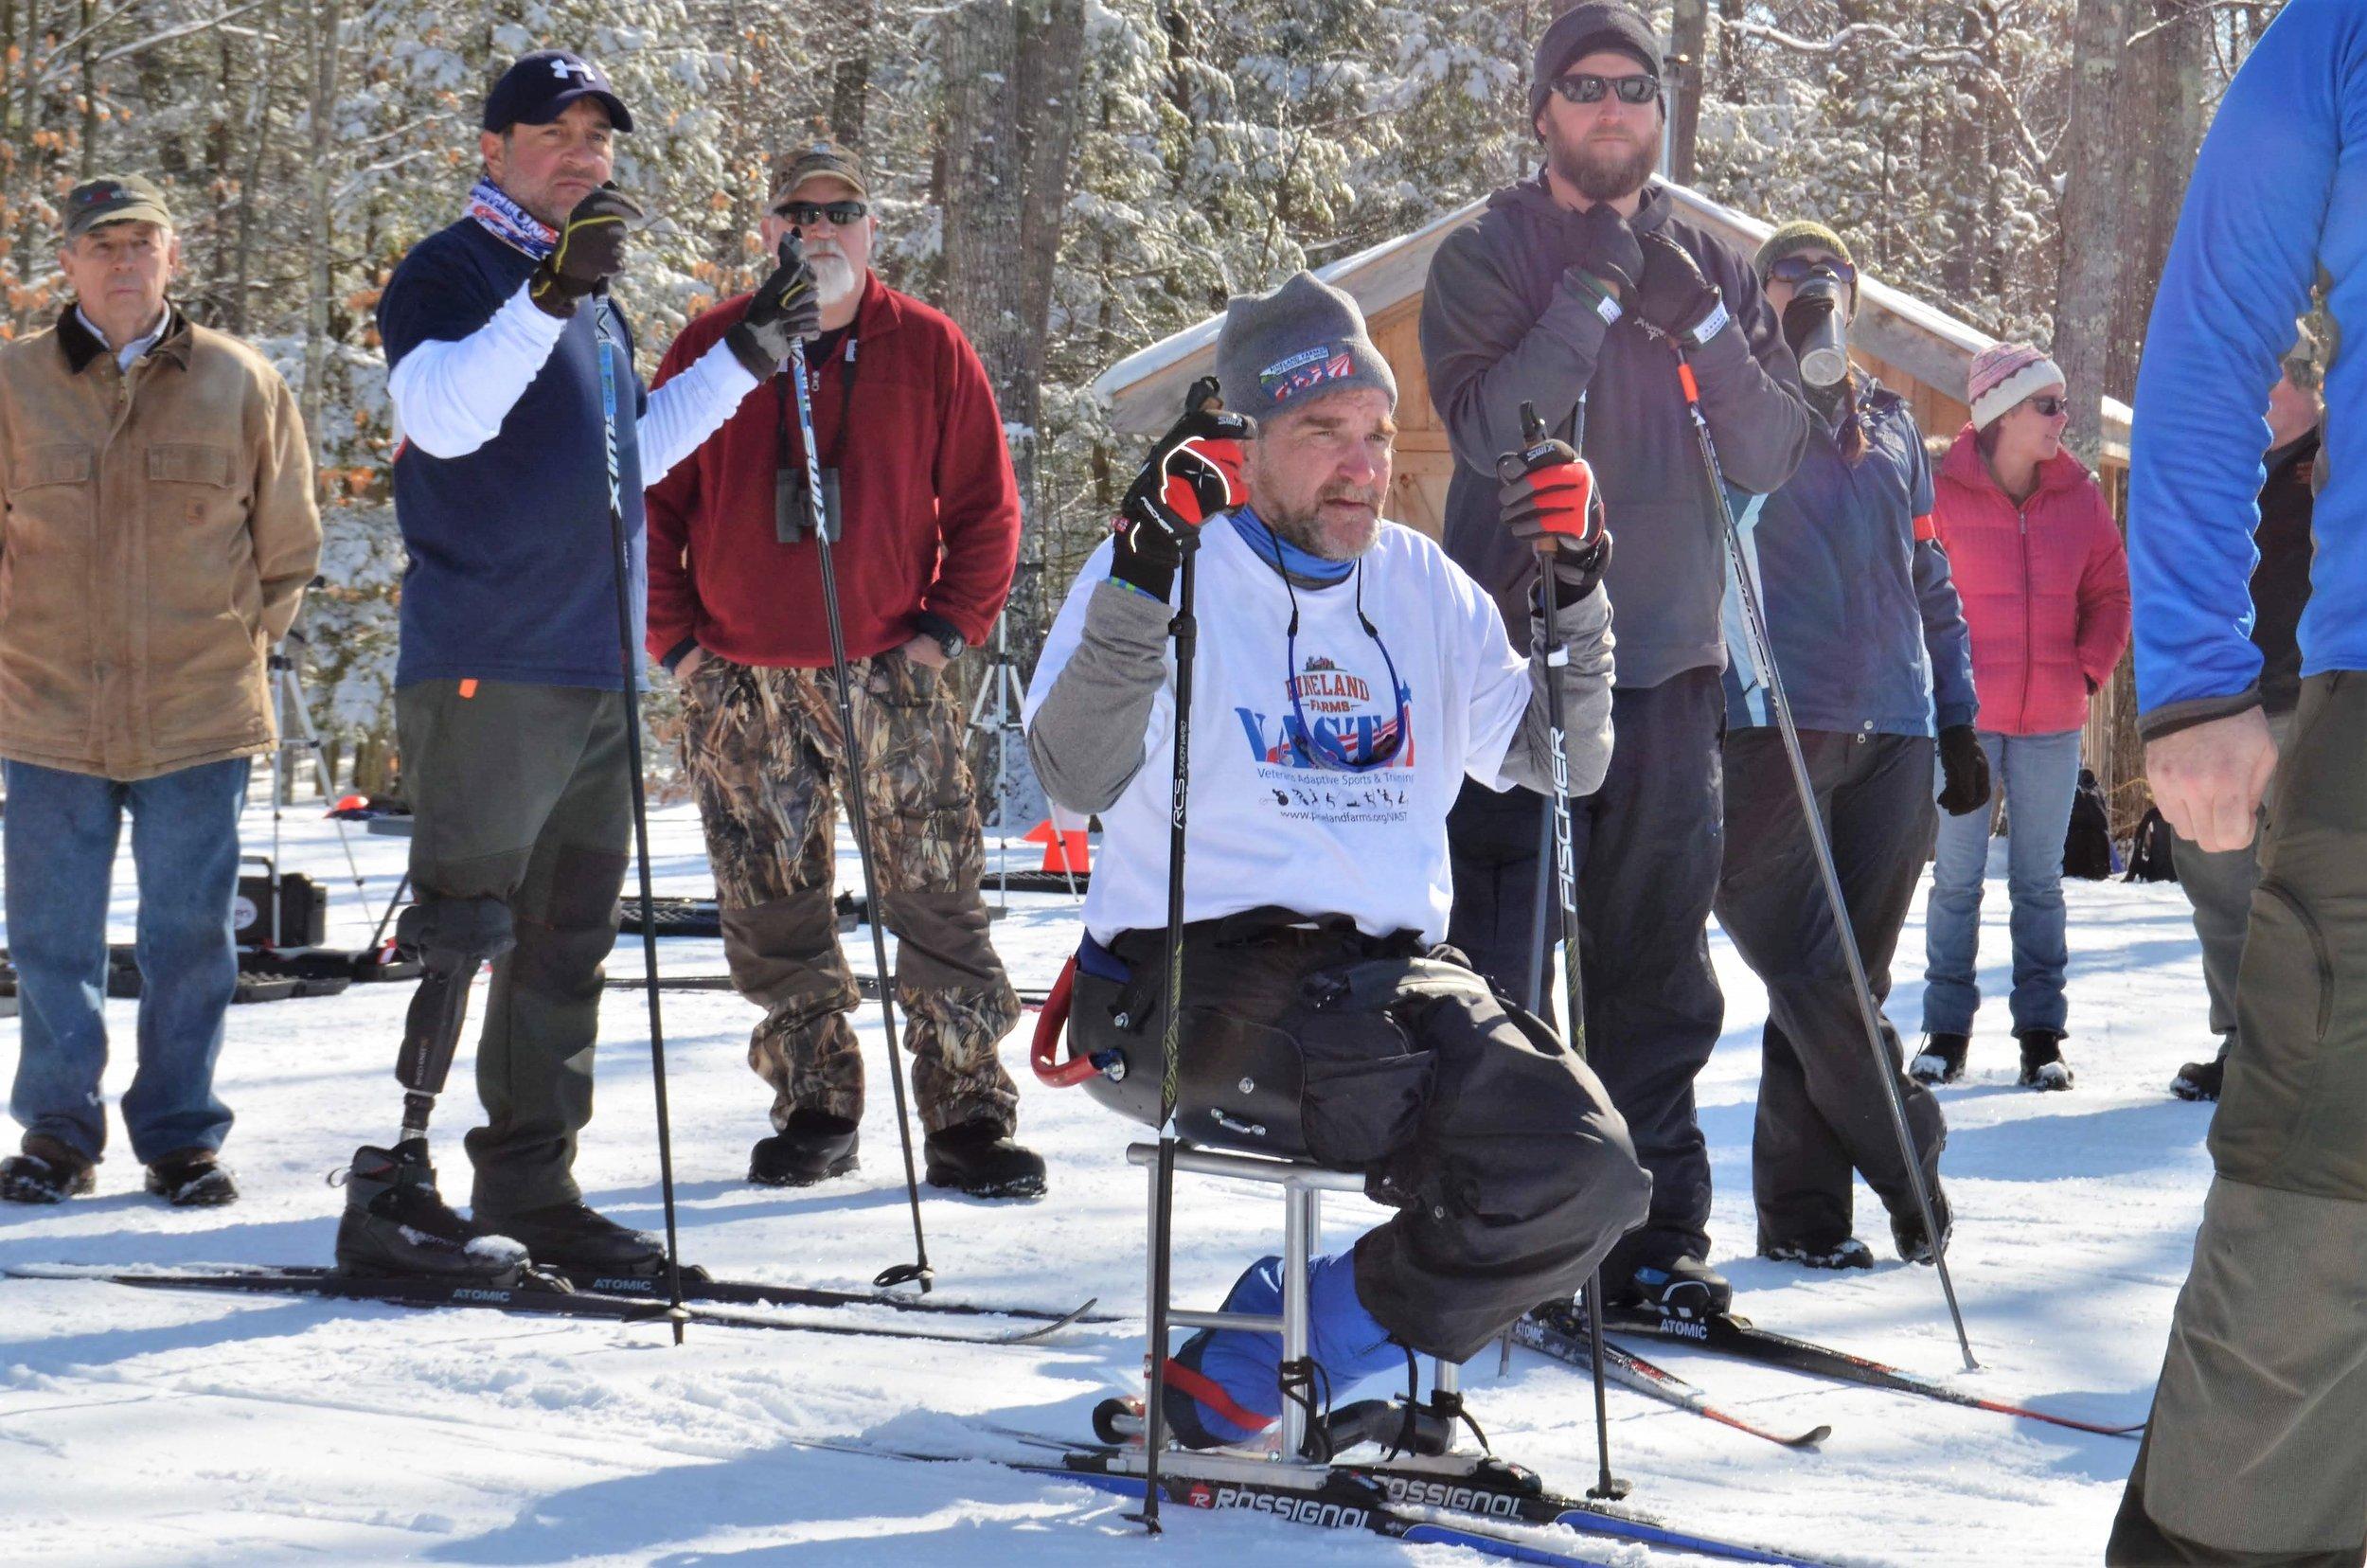 Sit ski and cross country ski camp for Veterans